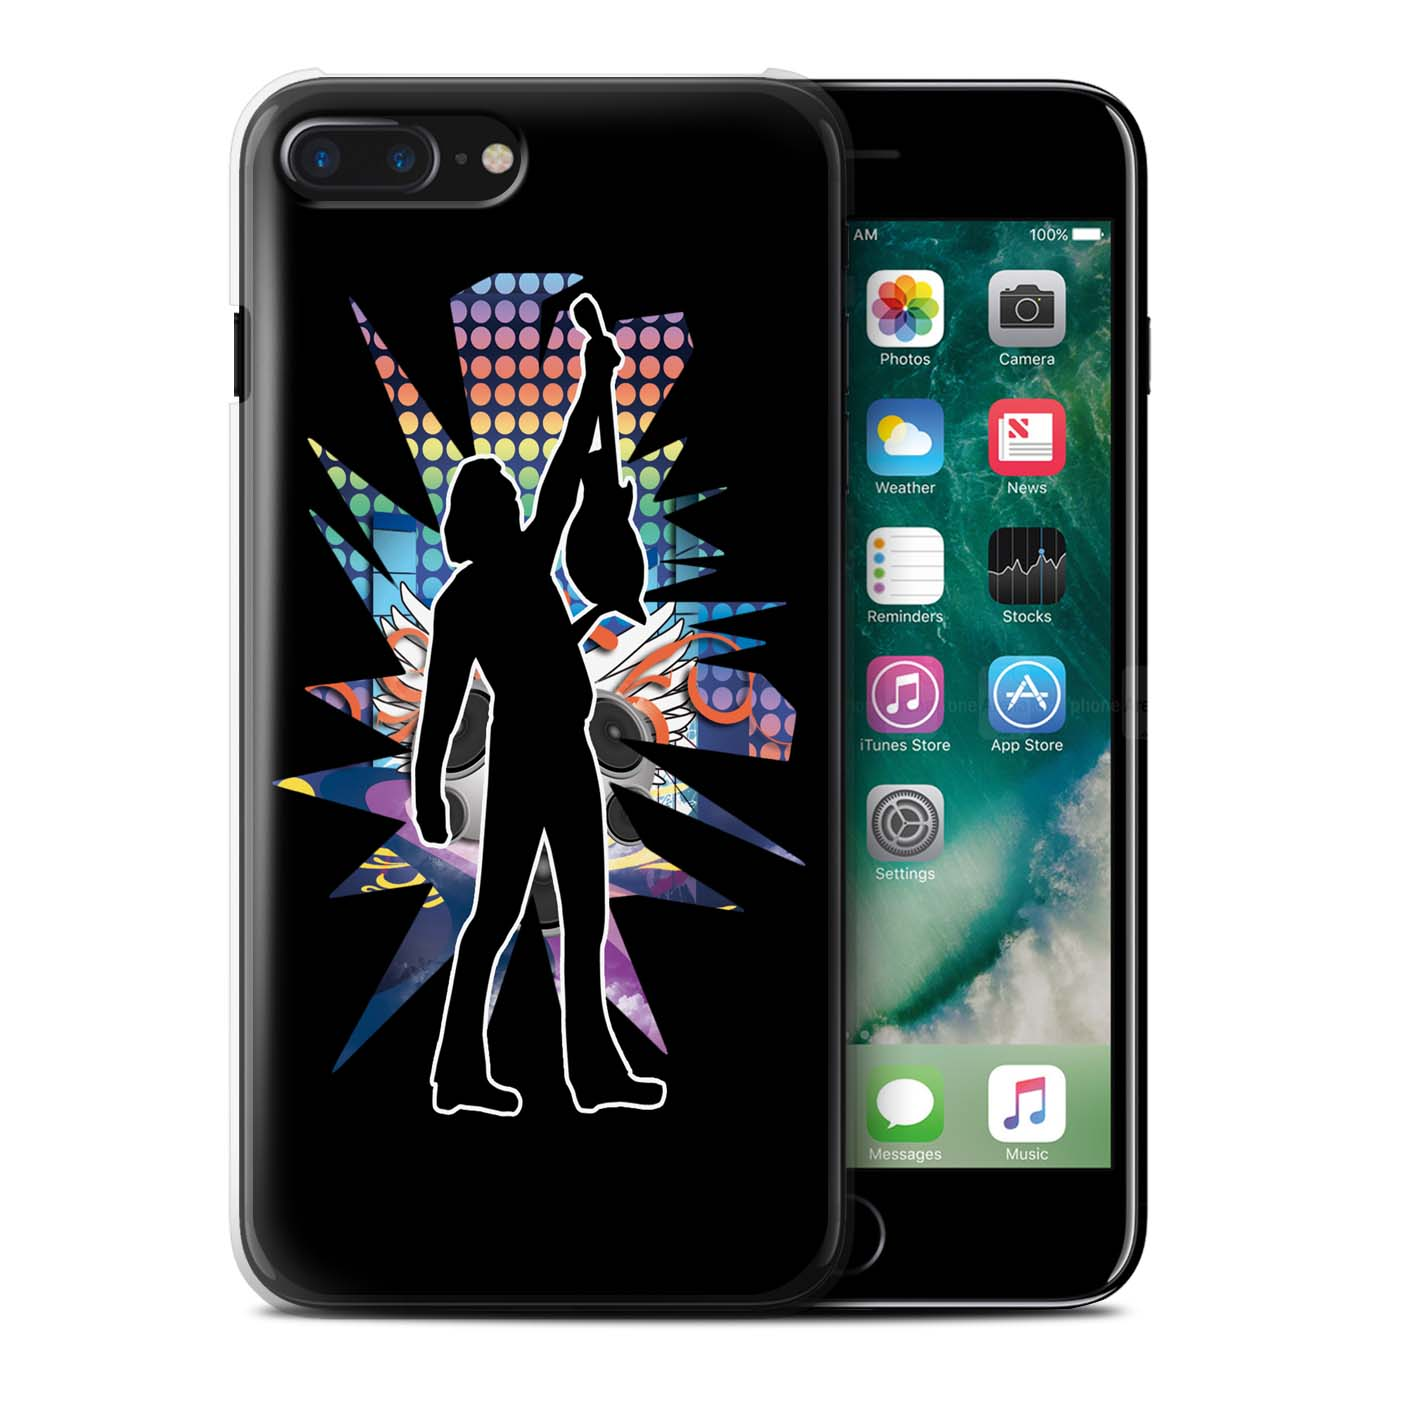 Coque-Etui-Housse-de-Stuff4-pour-Apple-iPhone-7-Plus-Rock-Star-Pose